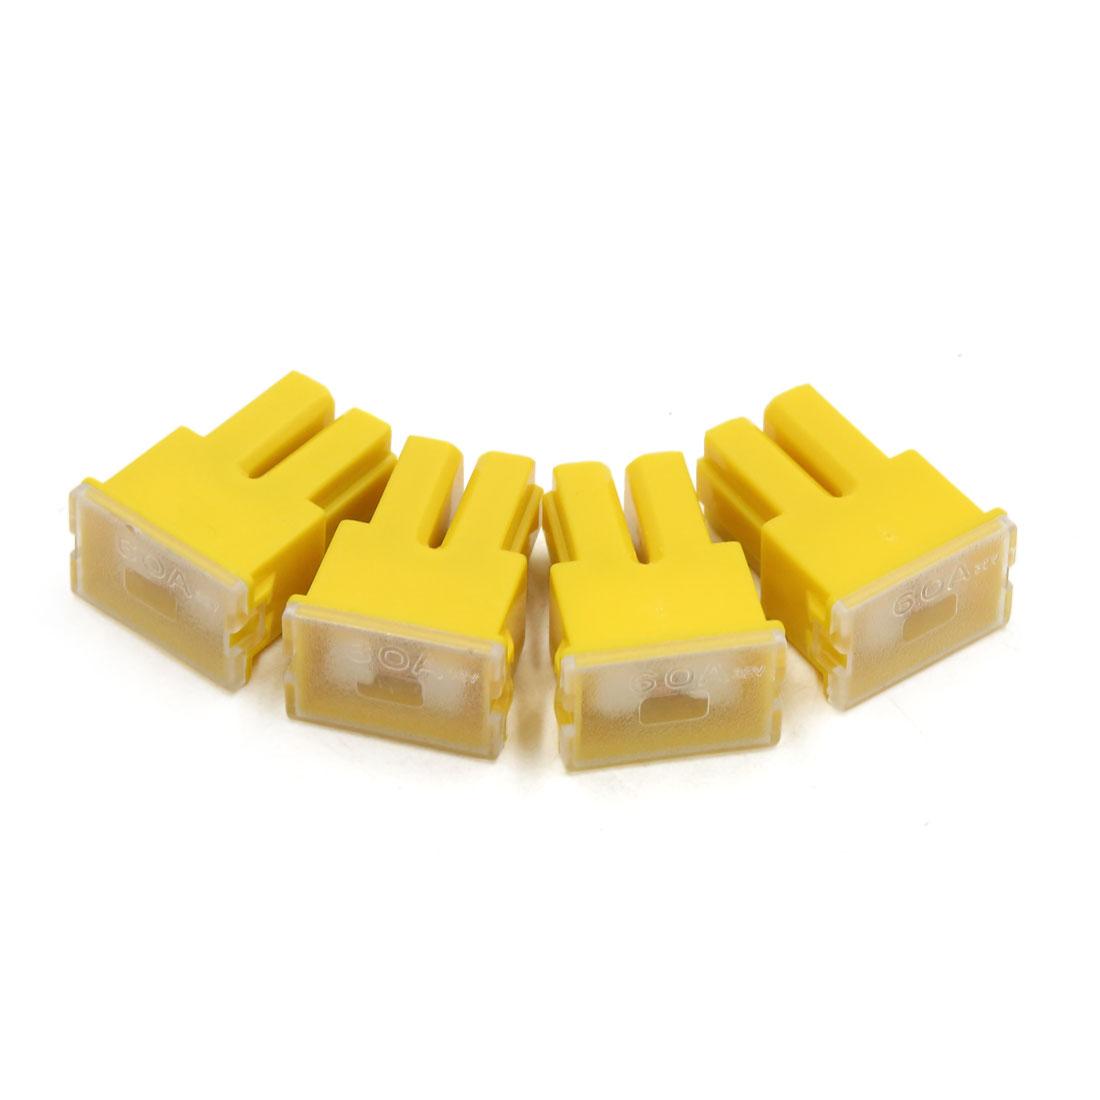 4pcs 32V 60A Yellow Plastic Casing Female PAL Cartridge Fuse for Car Vehicle